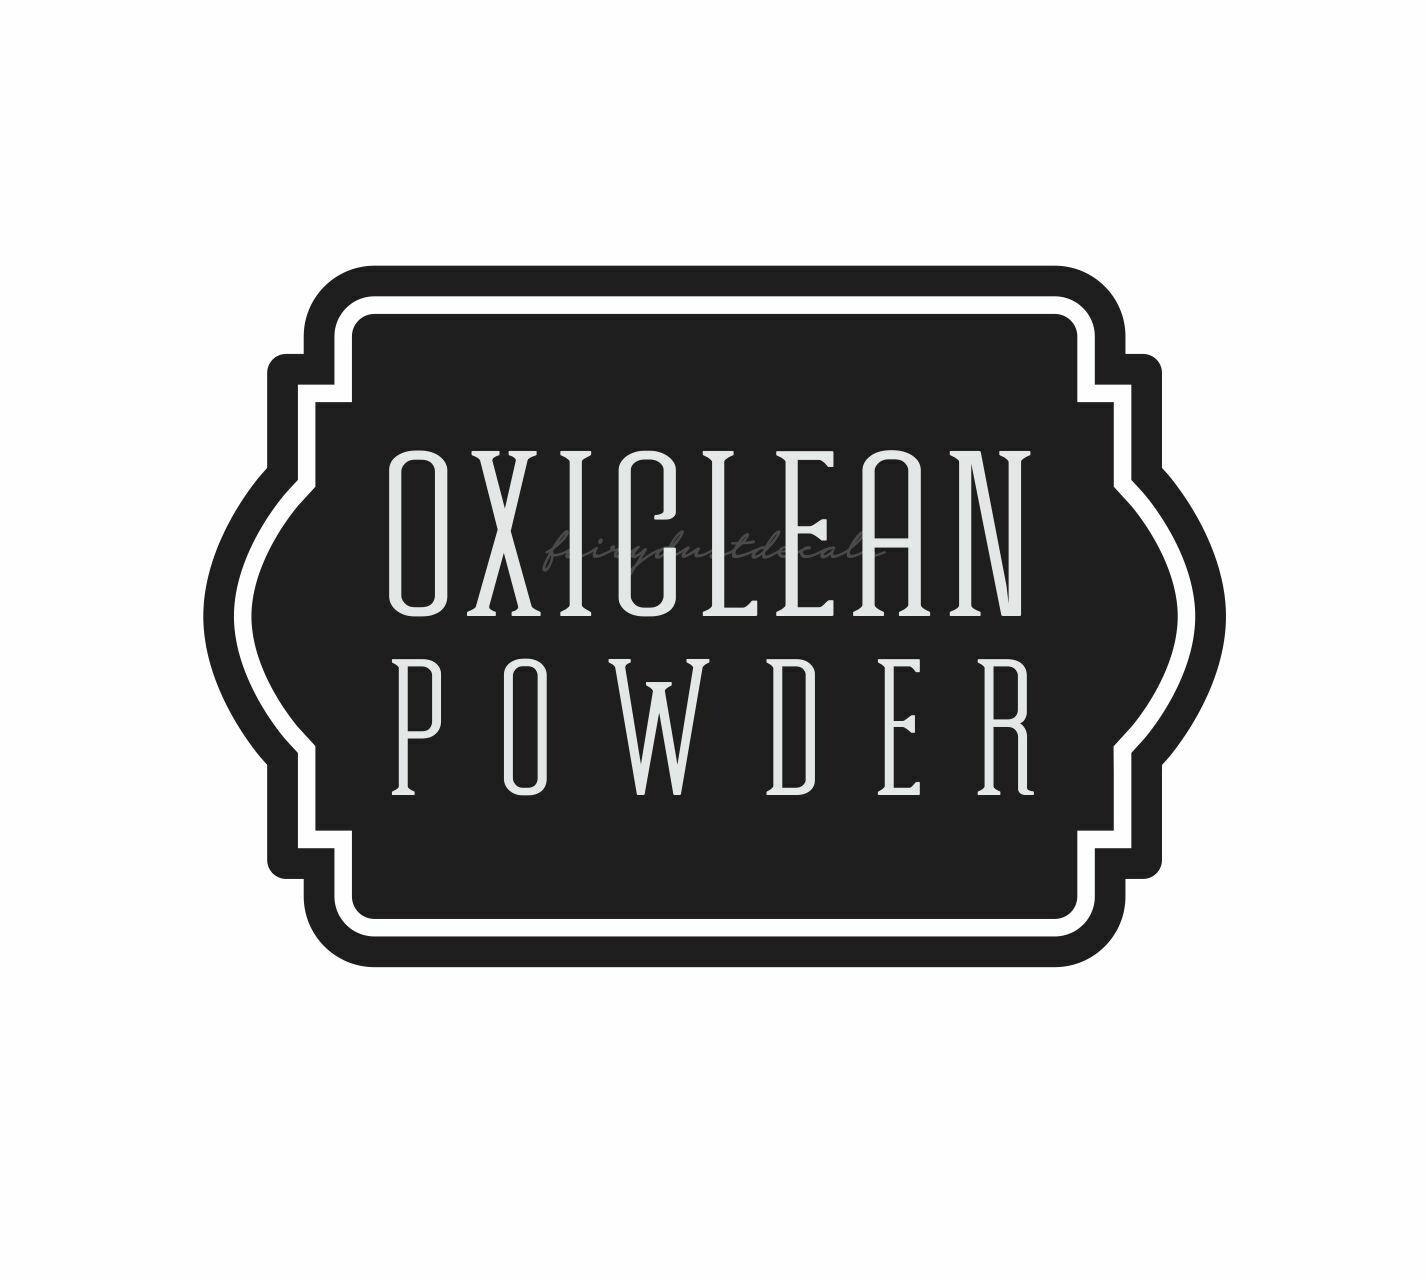 Oxiclean Powder Decal